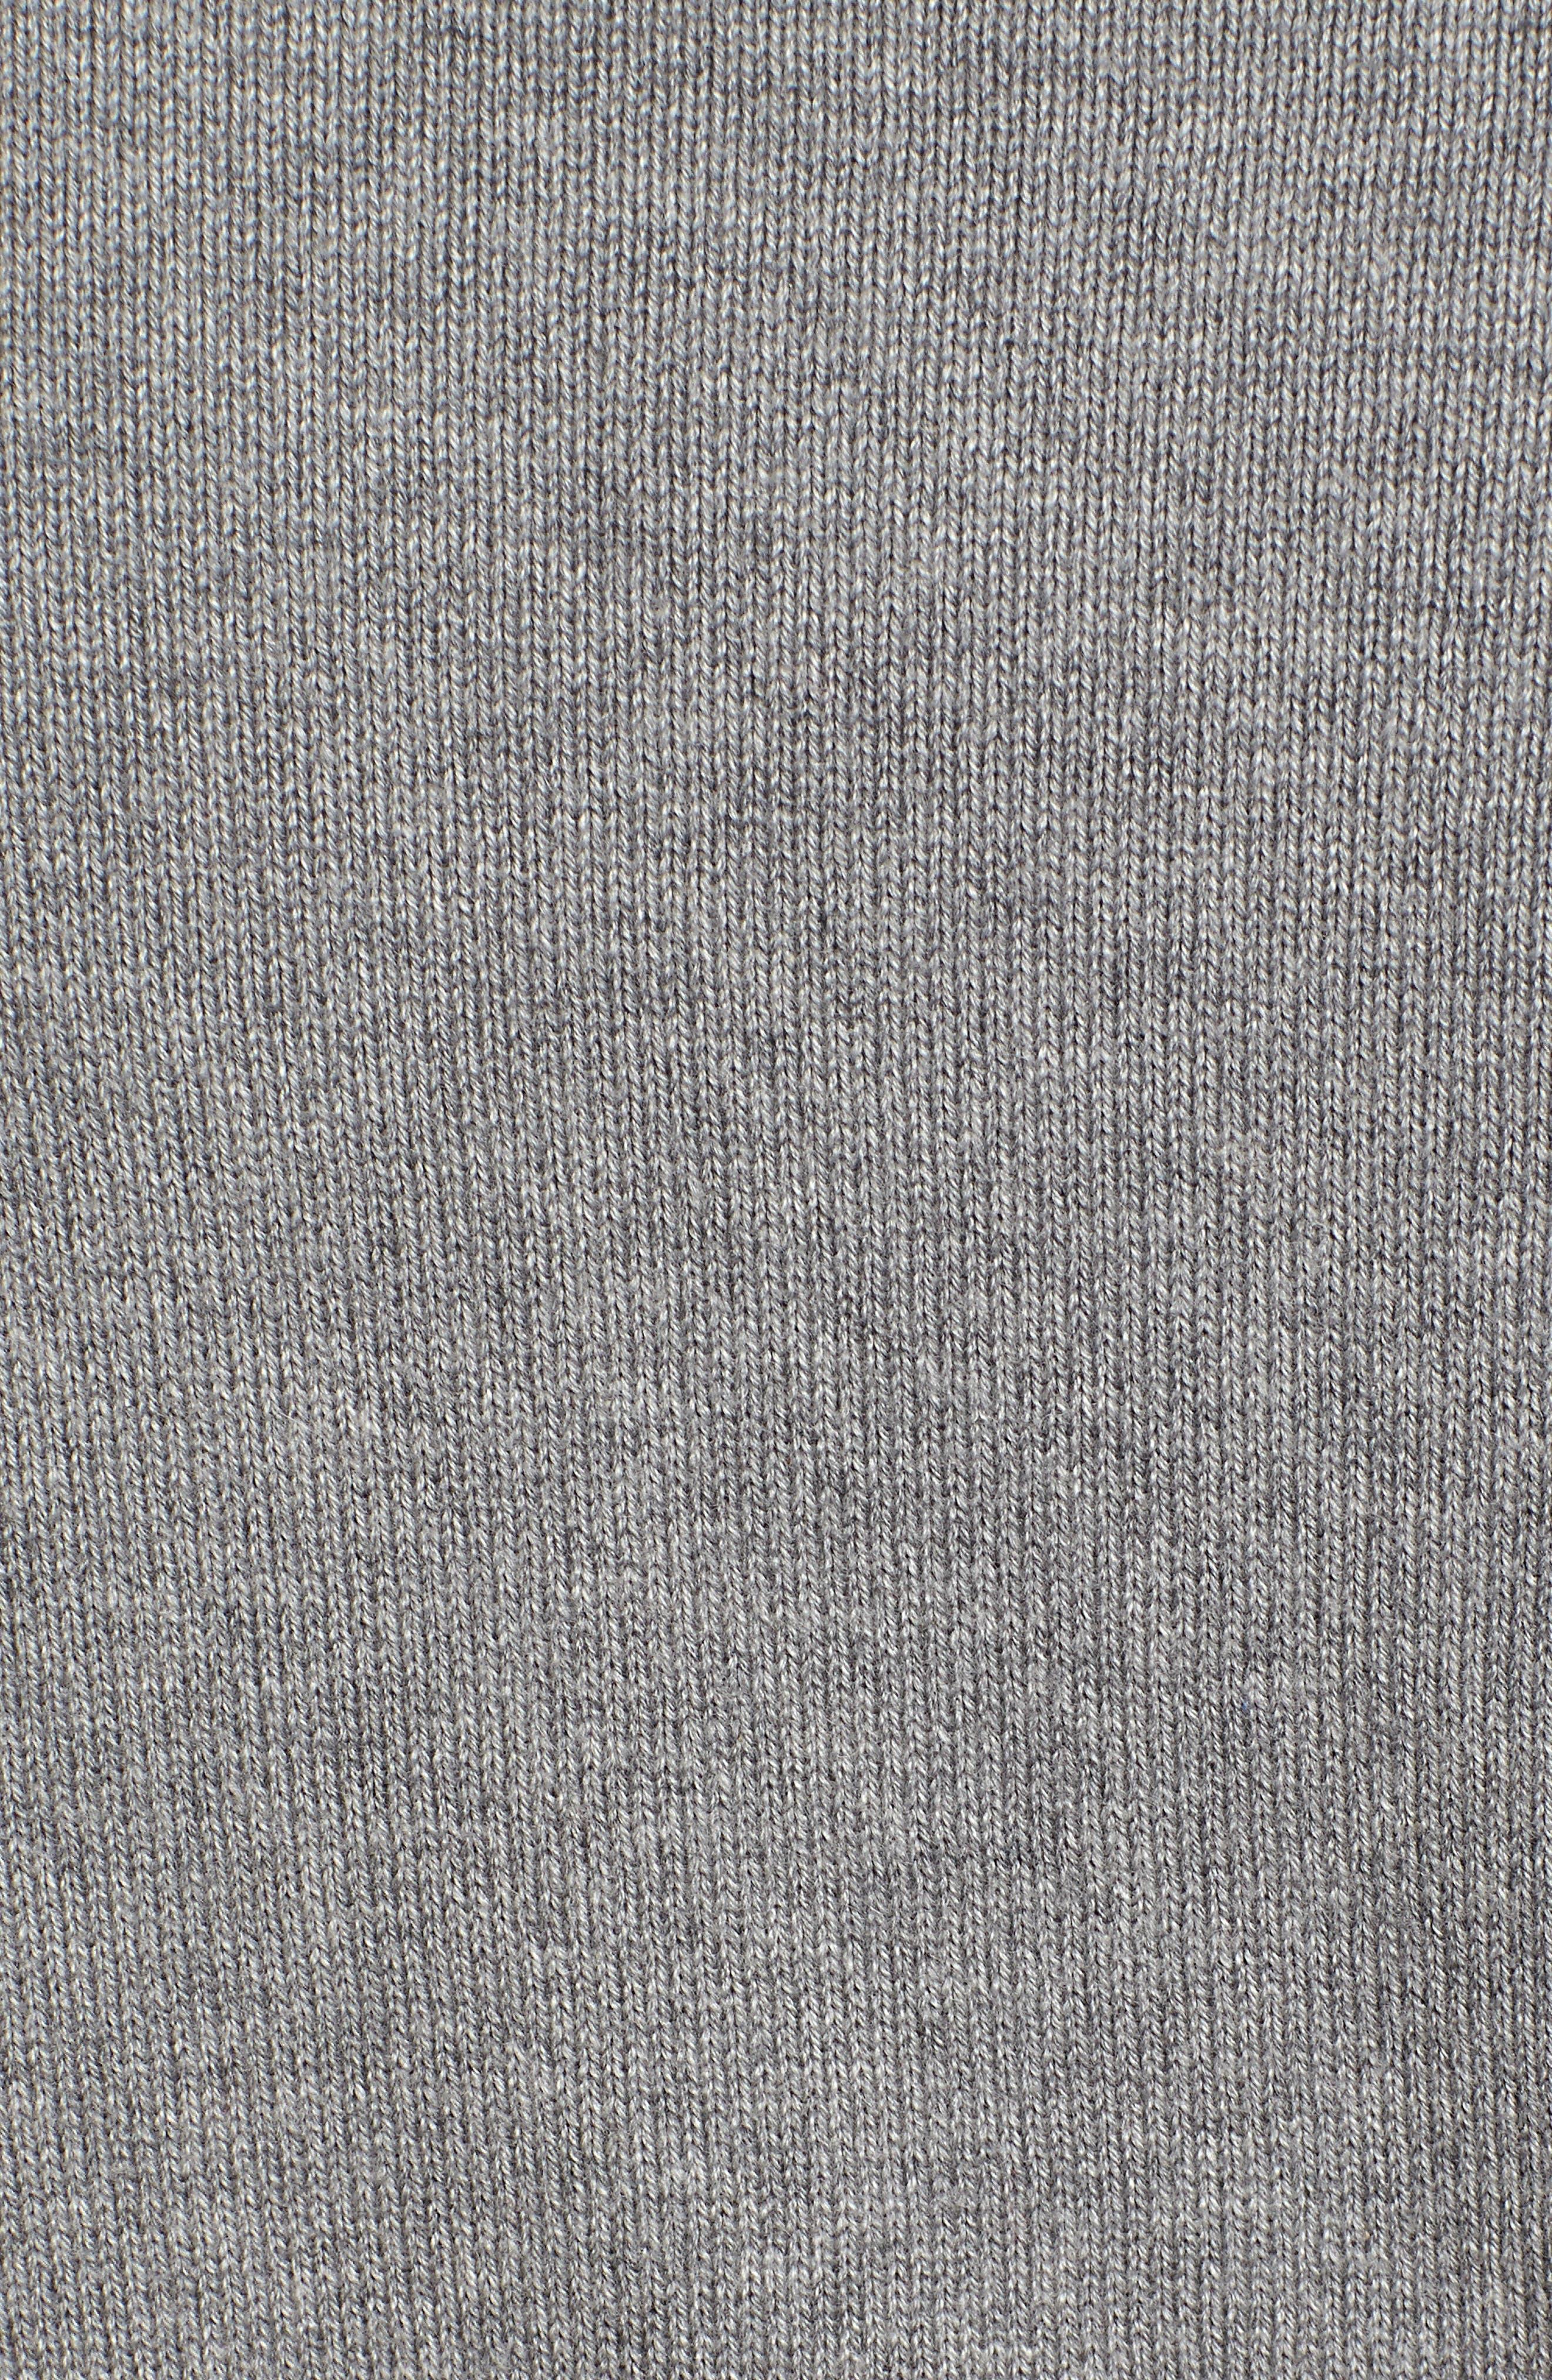 Cotton & Cashmere V-Neck Sweater,                             Alternate thumbnail 5, color,                             GRAY HEATHER